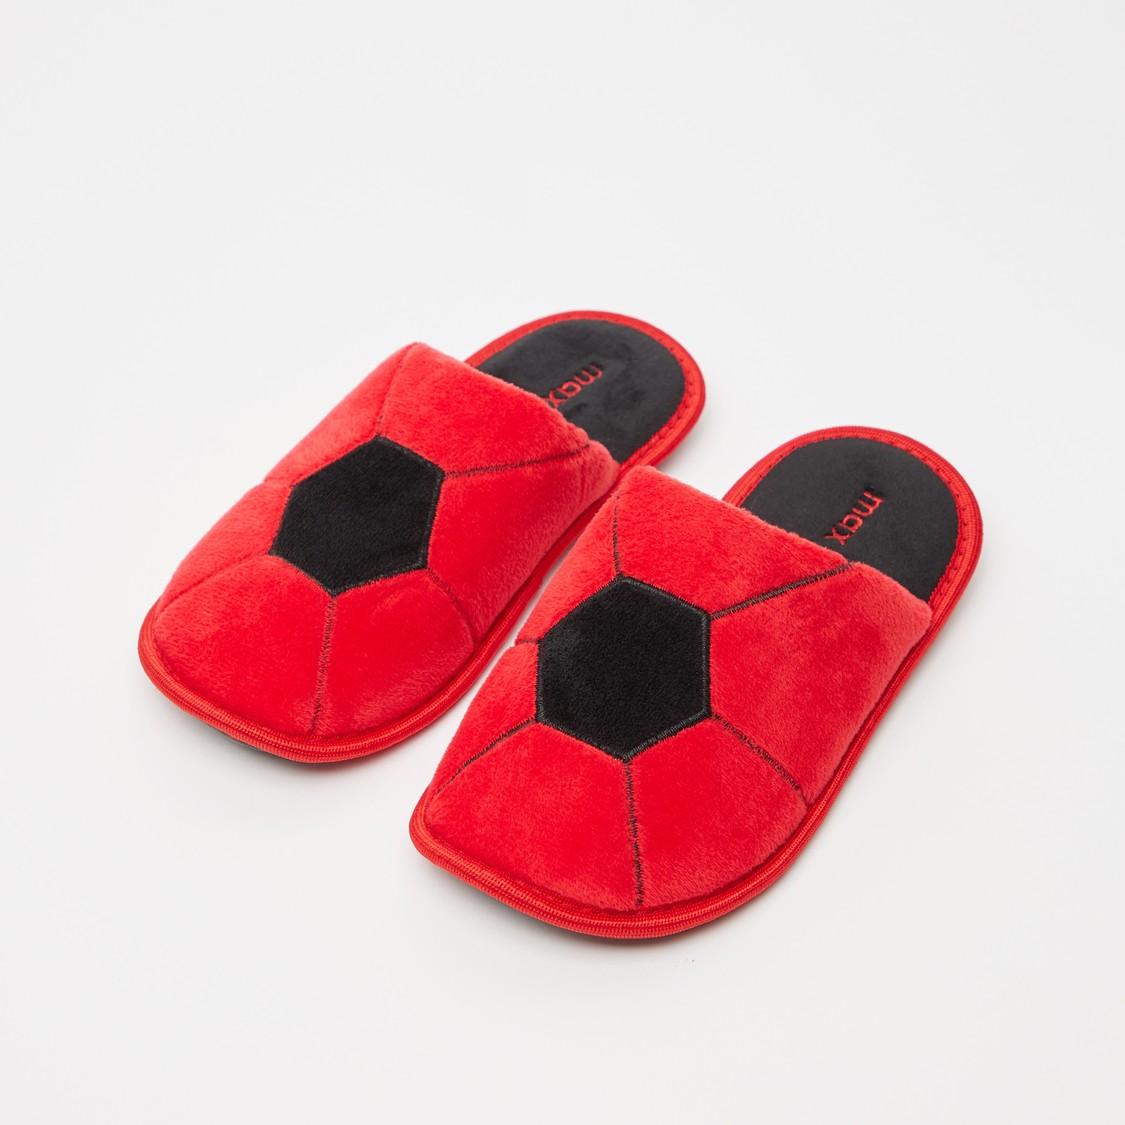 Football Themed Bedroom Slippers